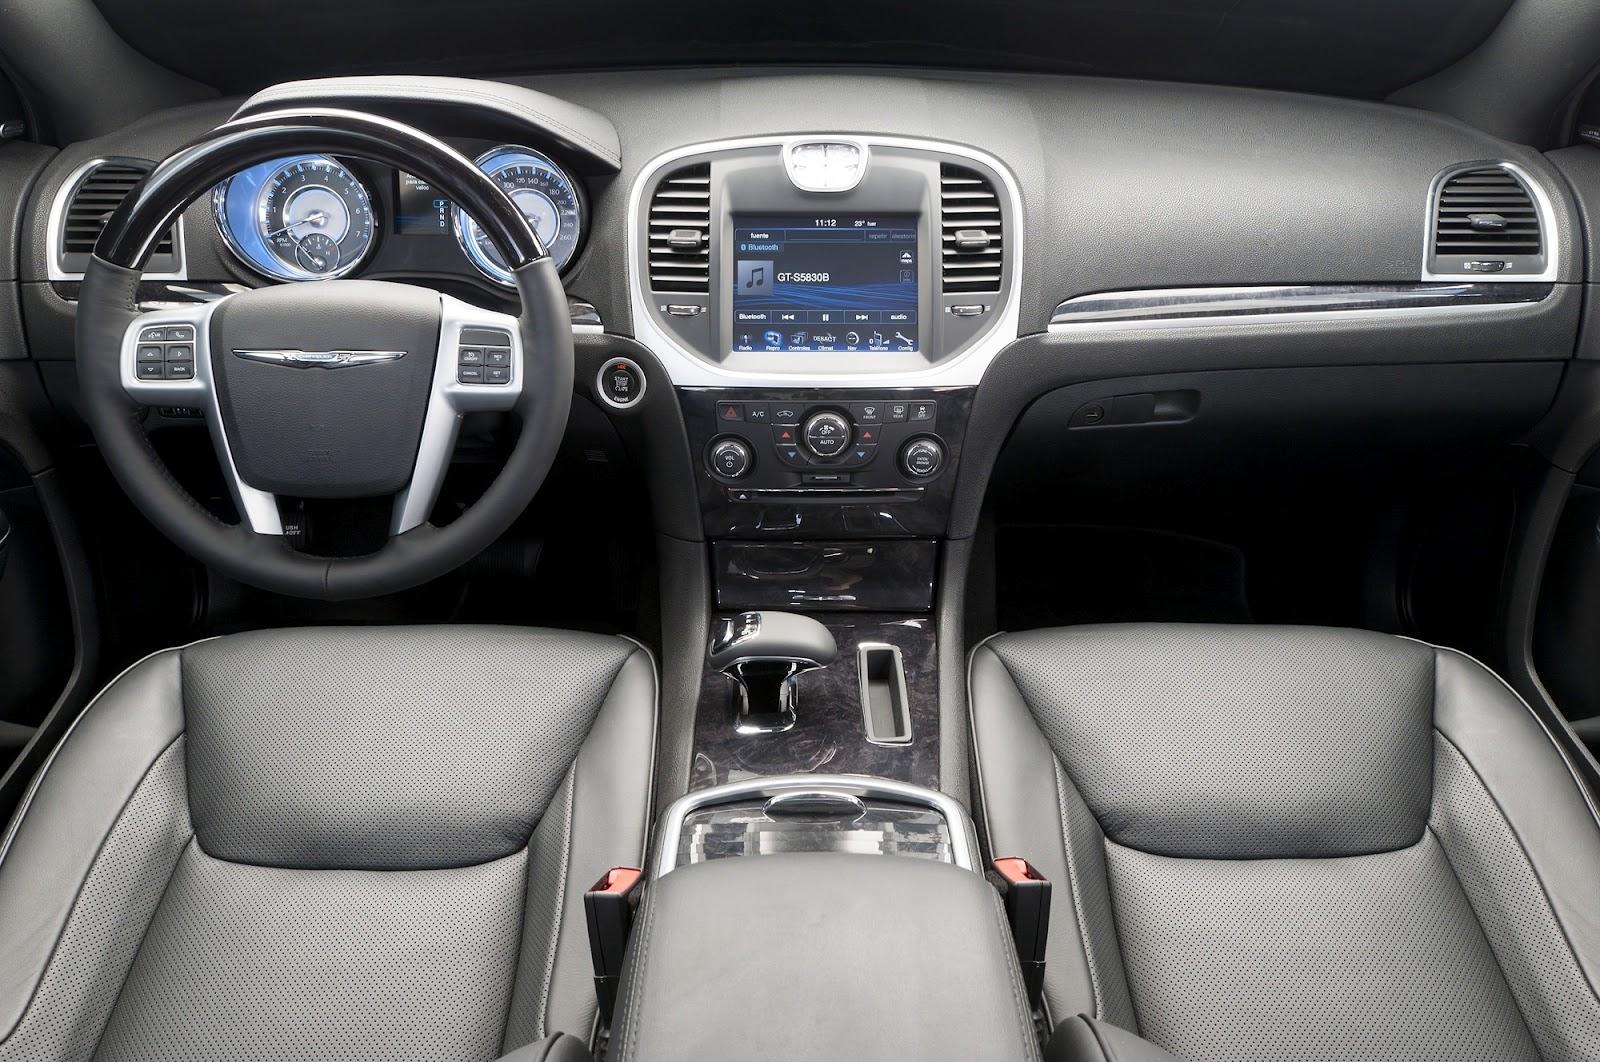 2013 chrysler related images,start 450 - WeiLi Automotive Network